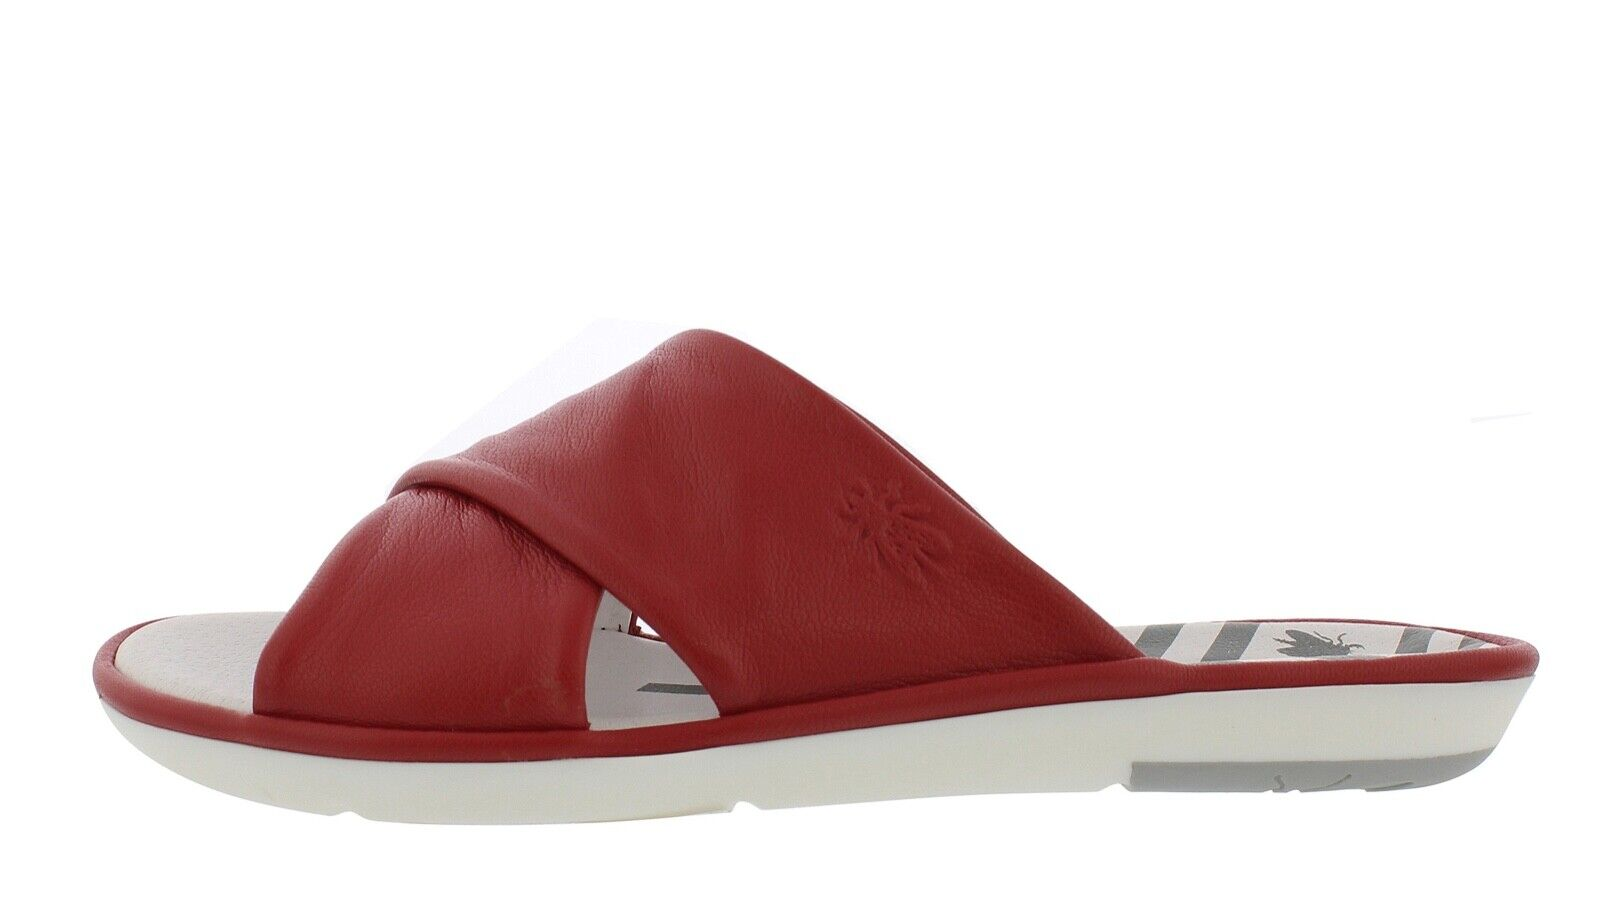 Fly London NEW Muda lipstick red genuine leather flat slider sandals sizes 3-9